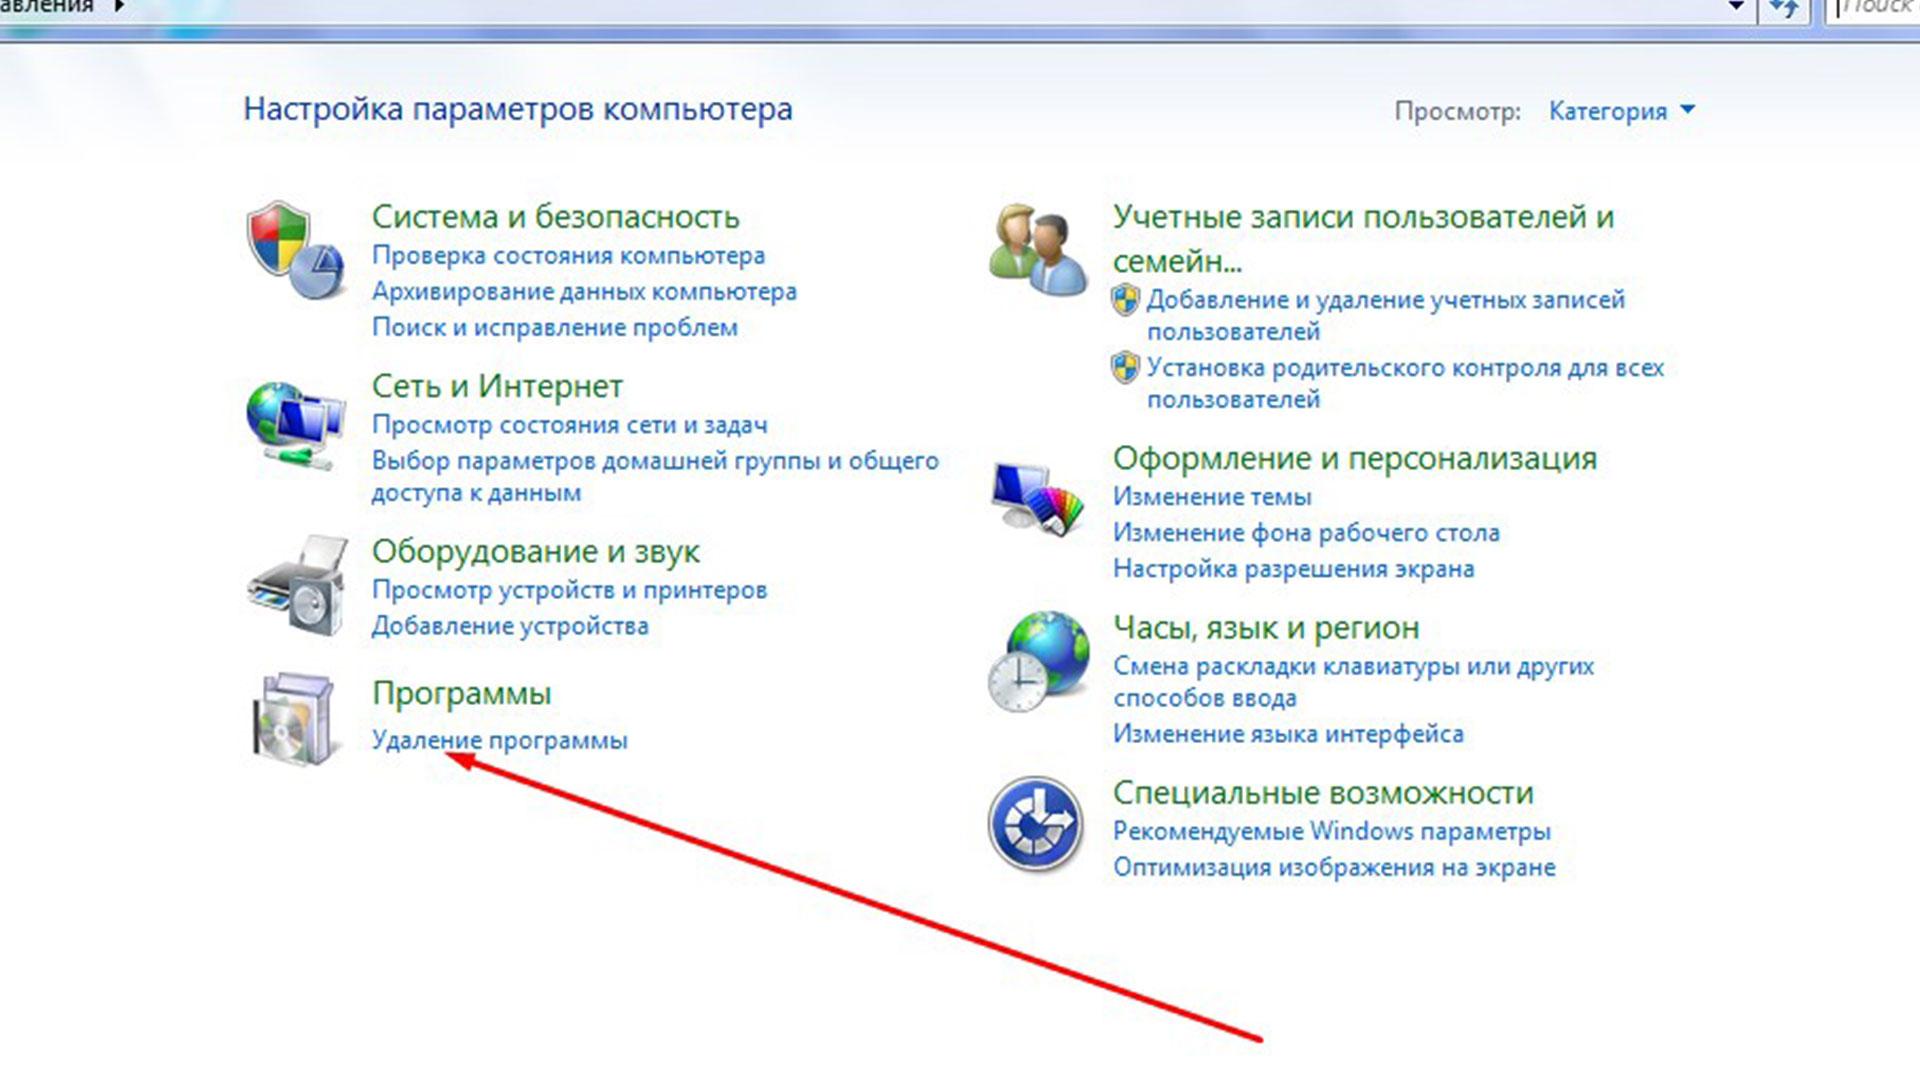 список программ для компьютера windows 7